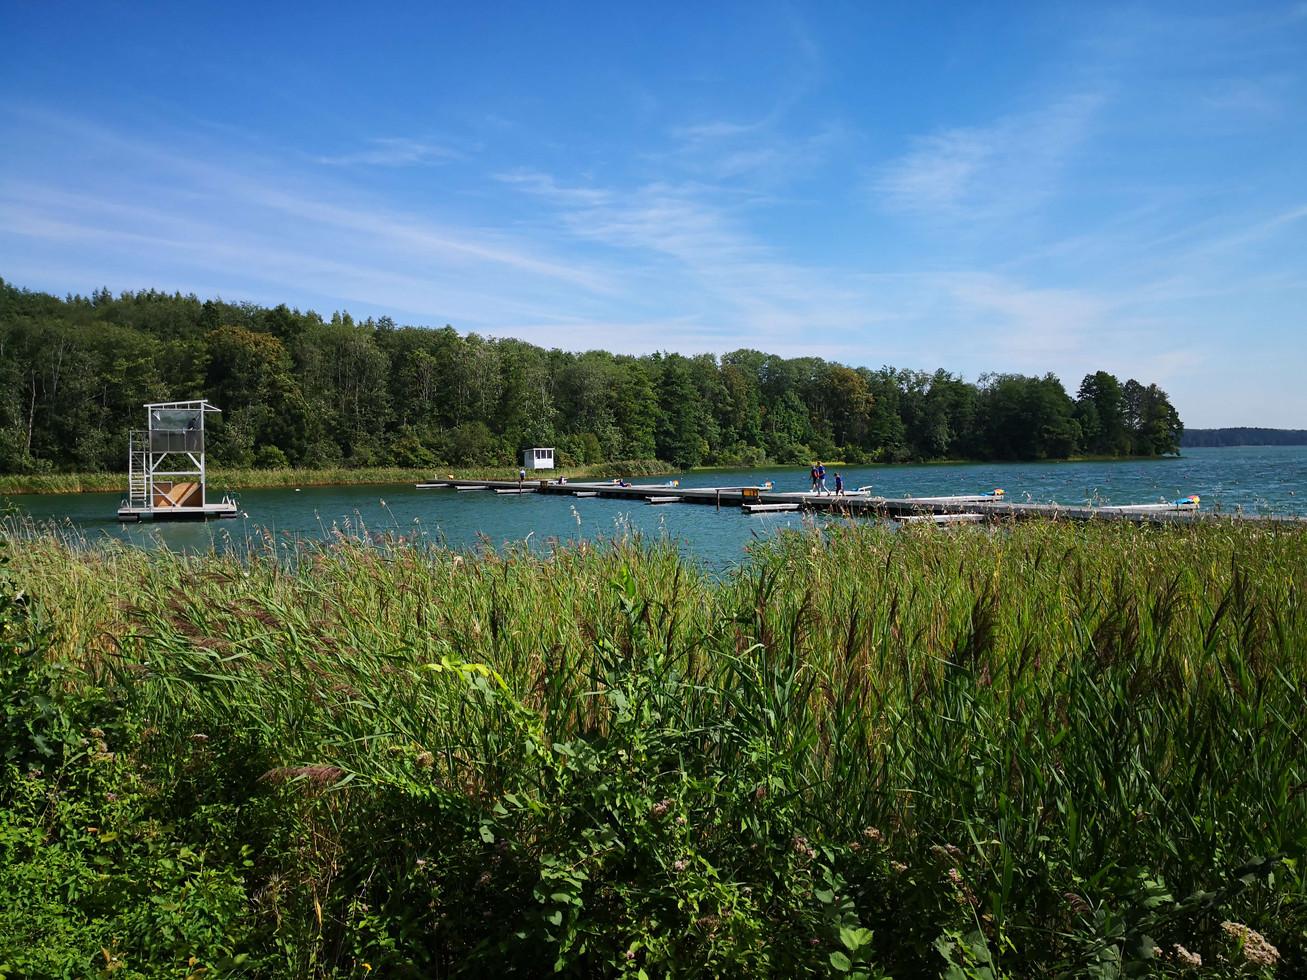 Rowing start in Trakai Lithuania